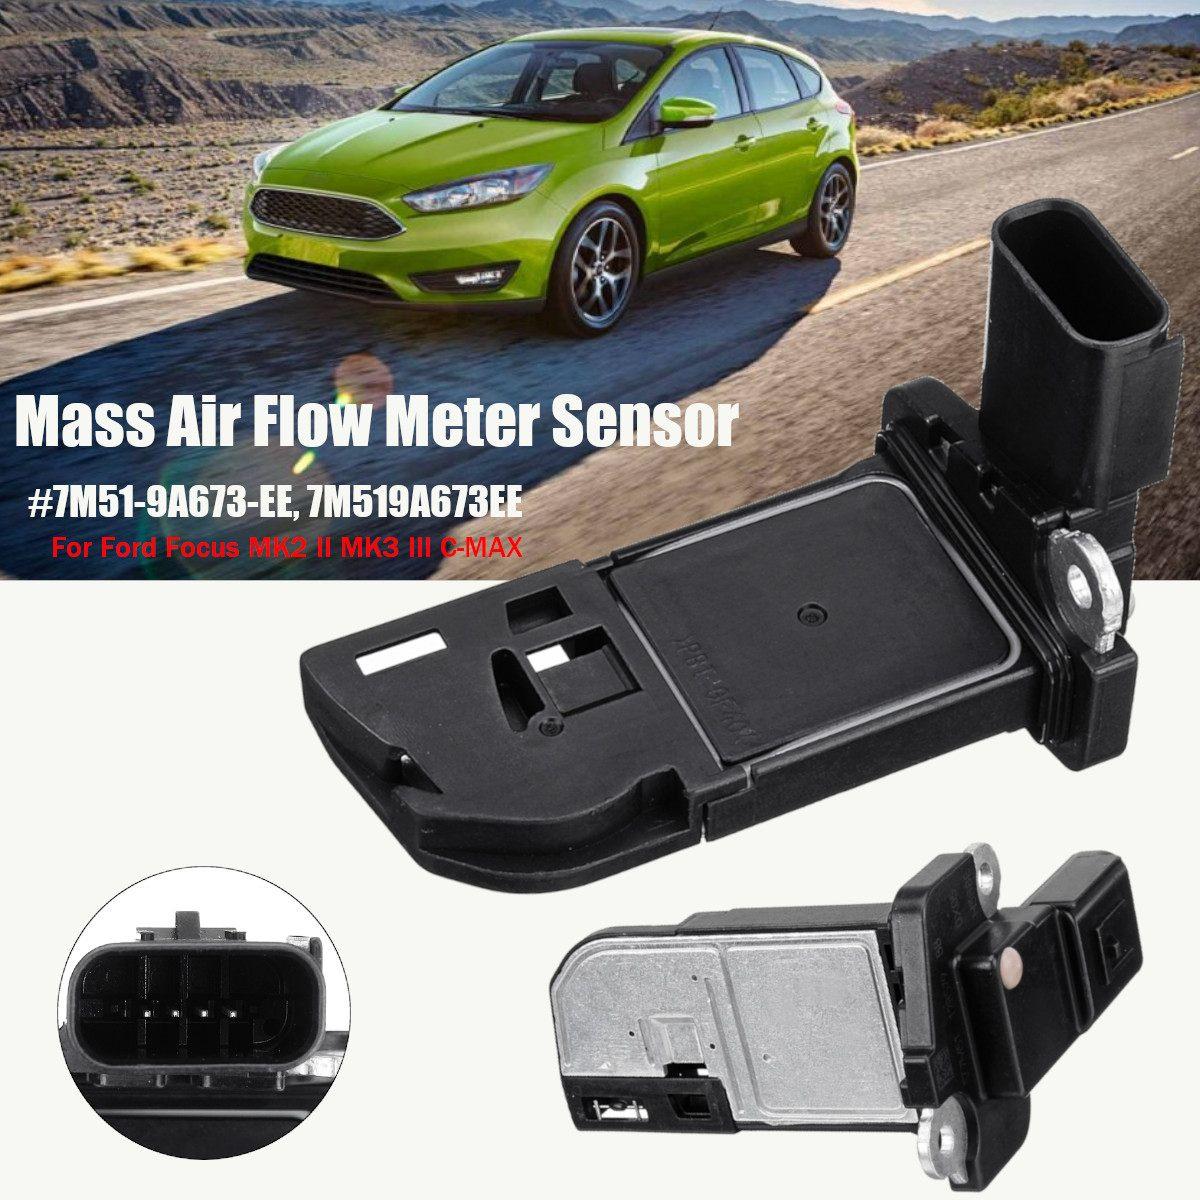 Mass Air Flow Meter for Ford Focus MK2 MK3 S//C-MAX 1.6 1.8 2.0 TDCi 7M5112B579BB